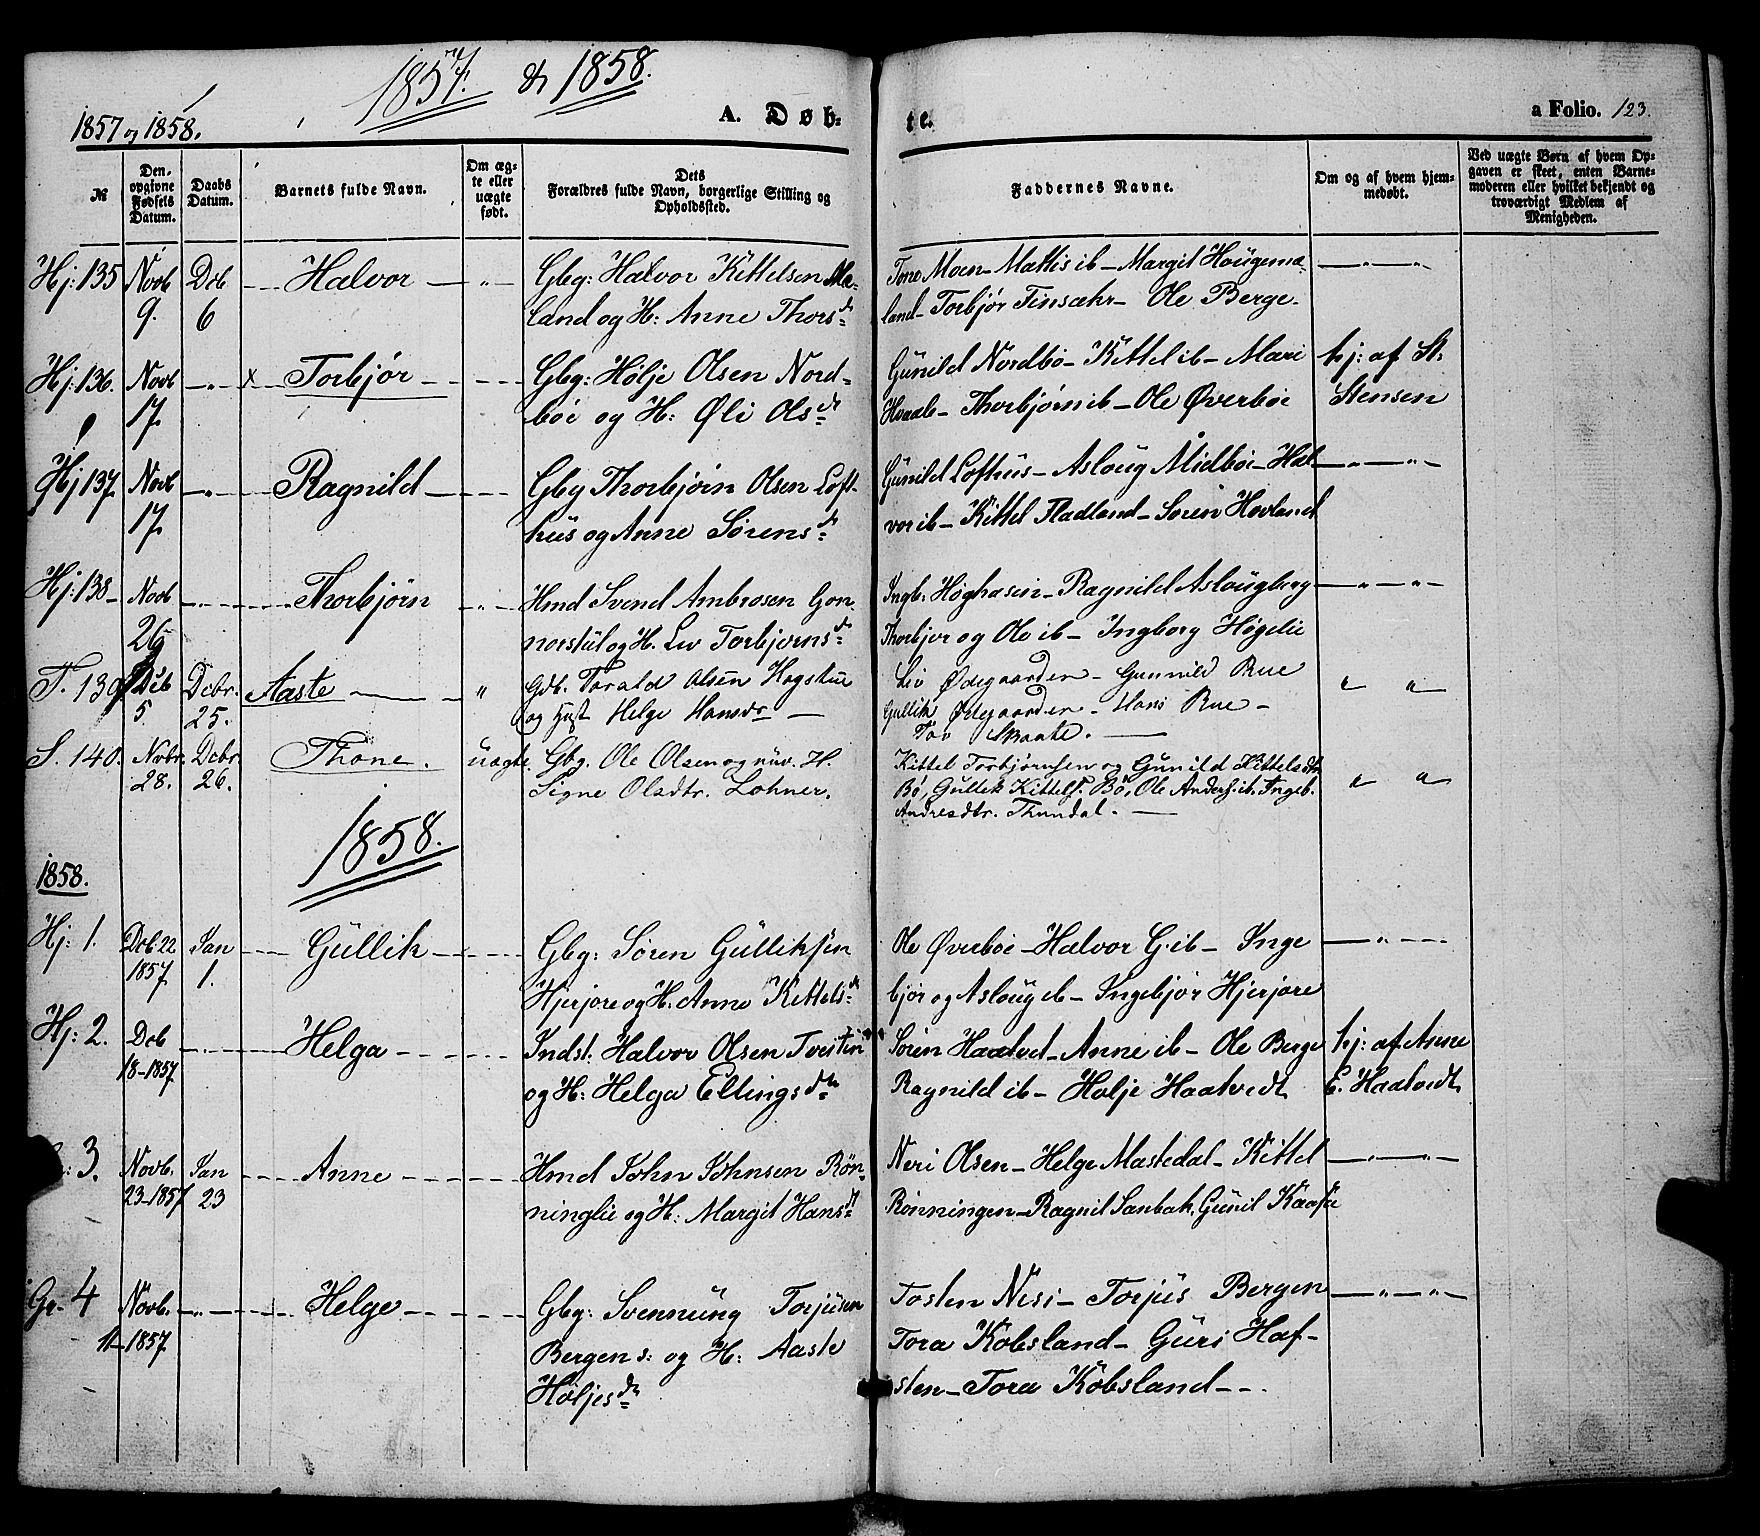 SAKO, Hjartdal kirkebøker, F/Fa/L0008: Ministerialbok nr. I 8, 1844-1859, s. 123